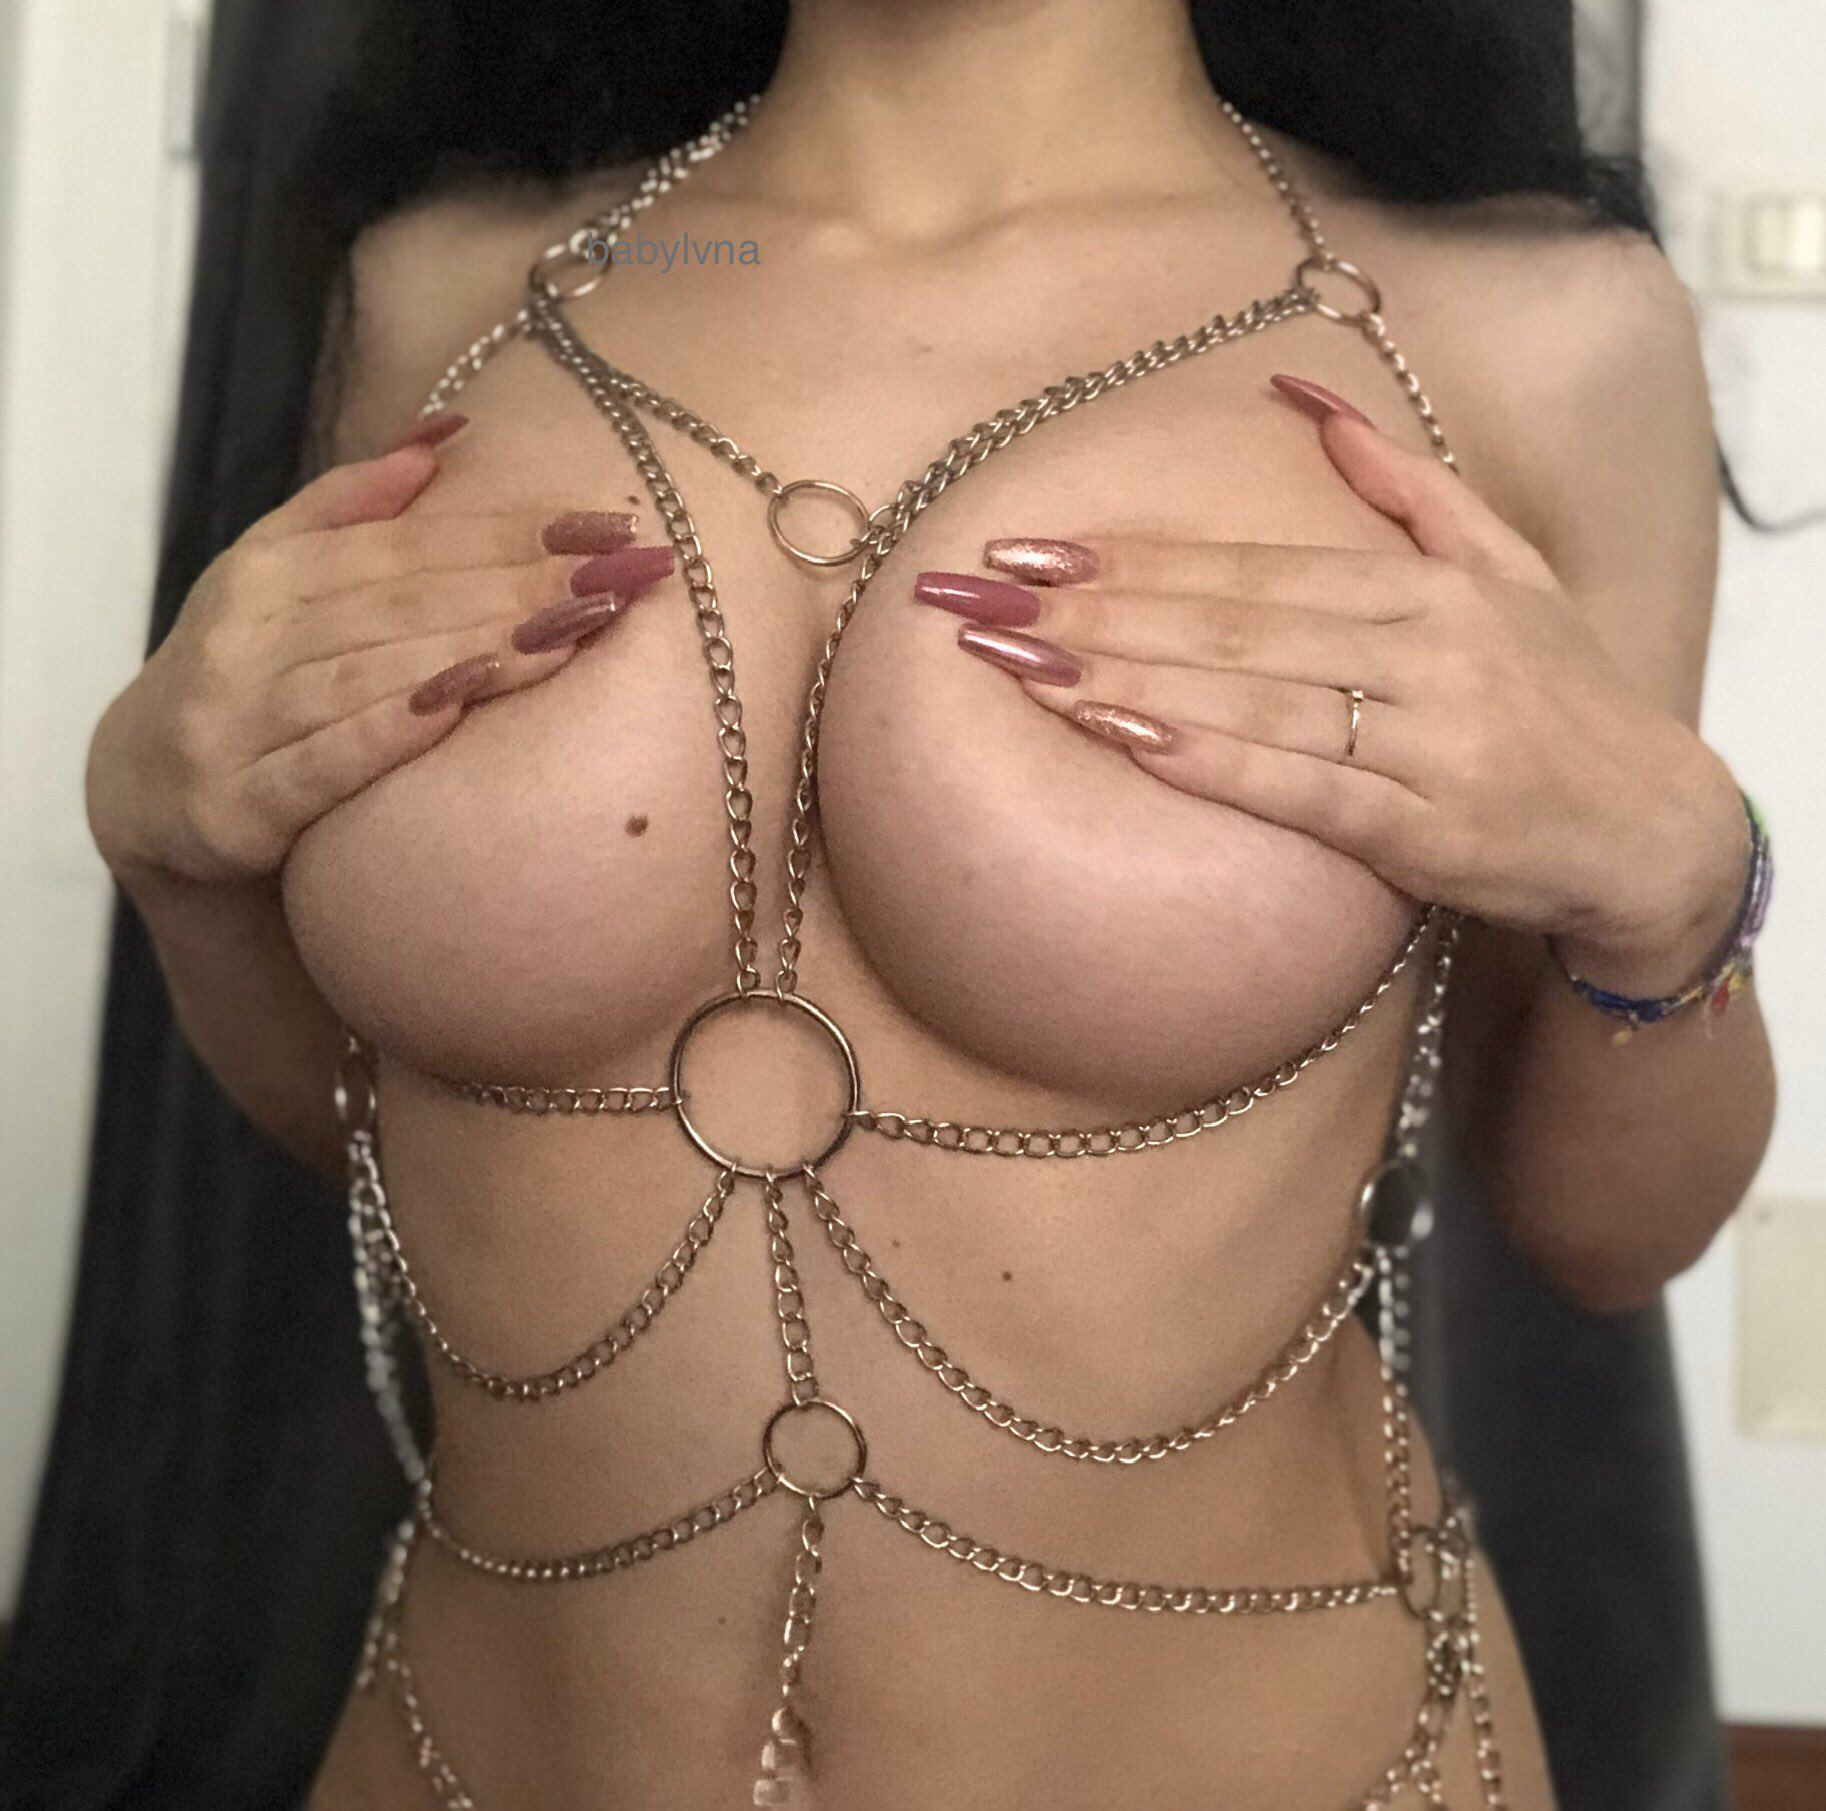 Babylvna Onlyfans Leaked Nude Photos